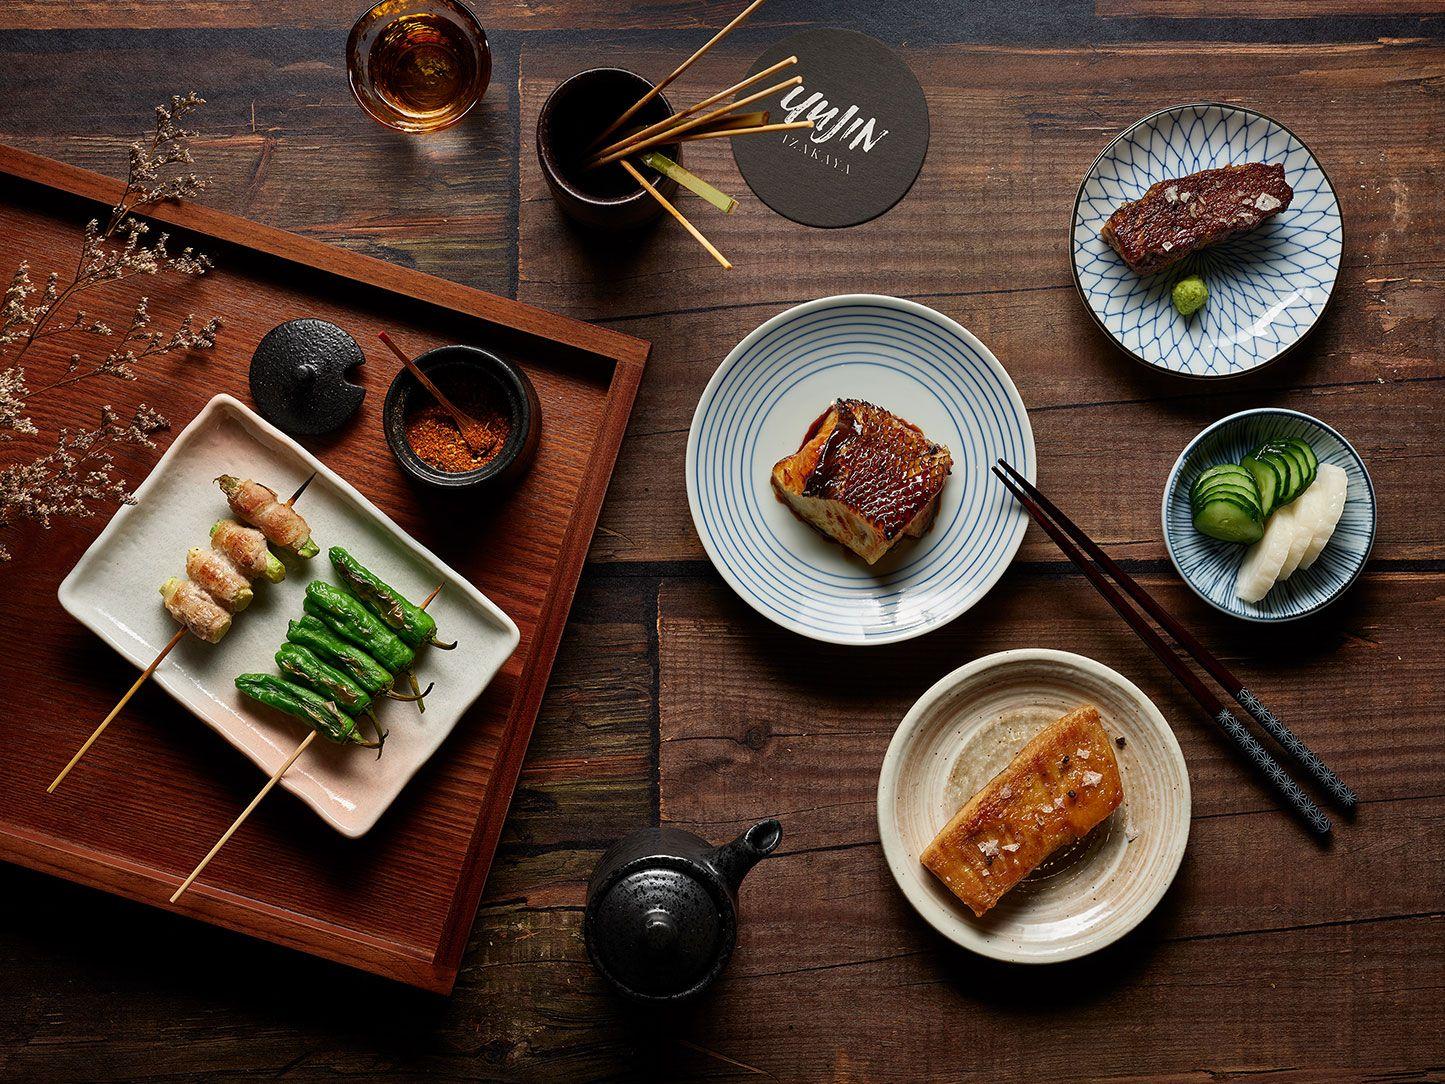 Where To Eat This Week: Carousel, Vianney Massot Restaurant, Yujin Izakaya, Jypsy, Ellenborough Market Café